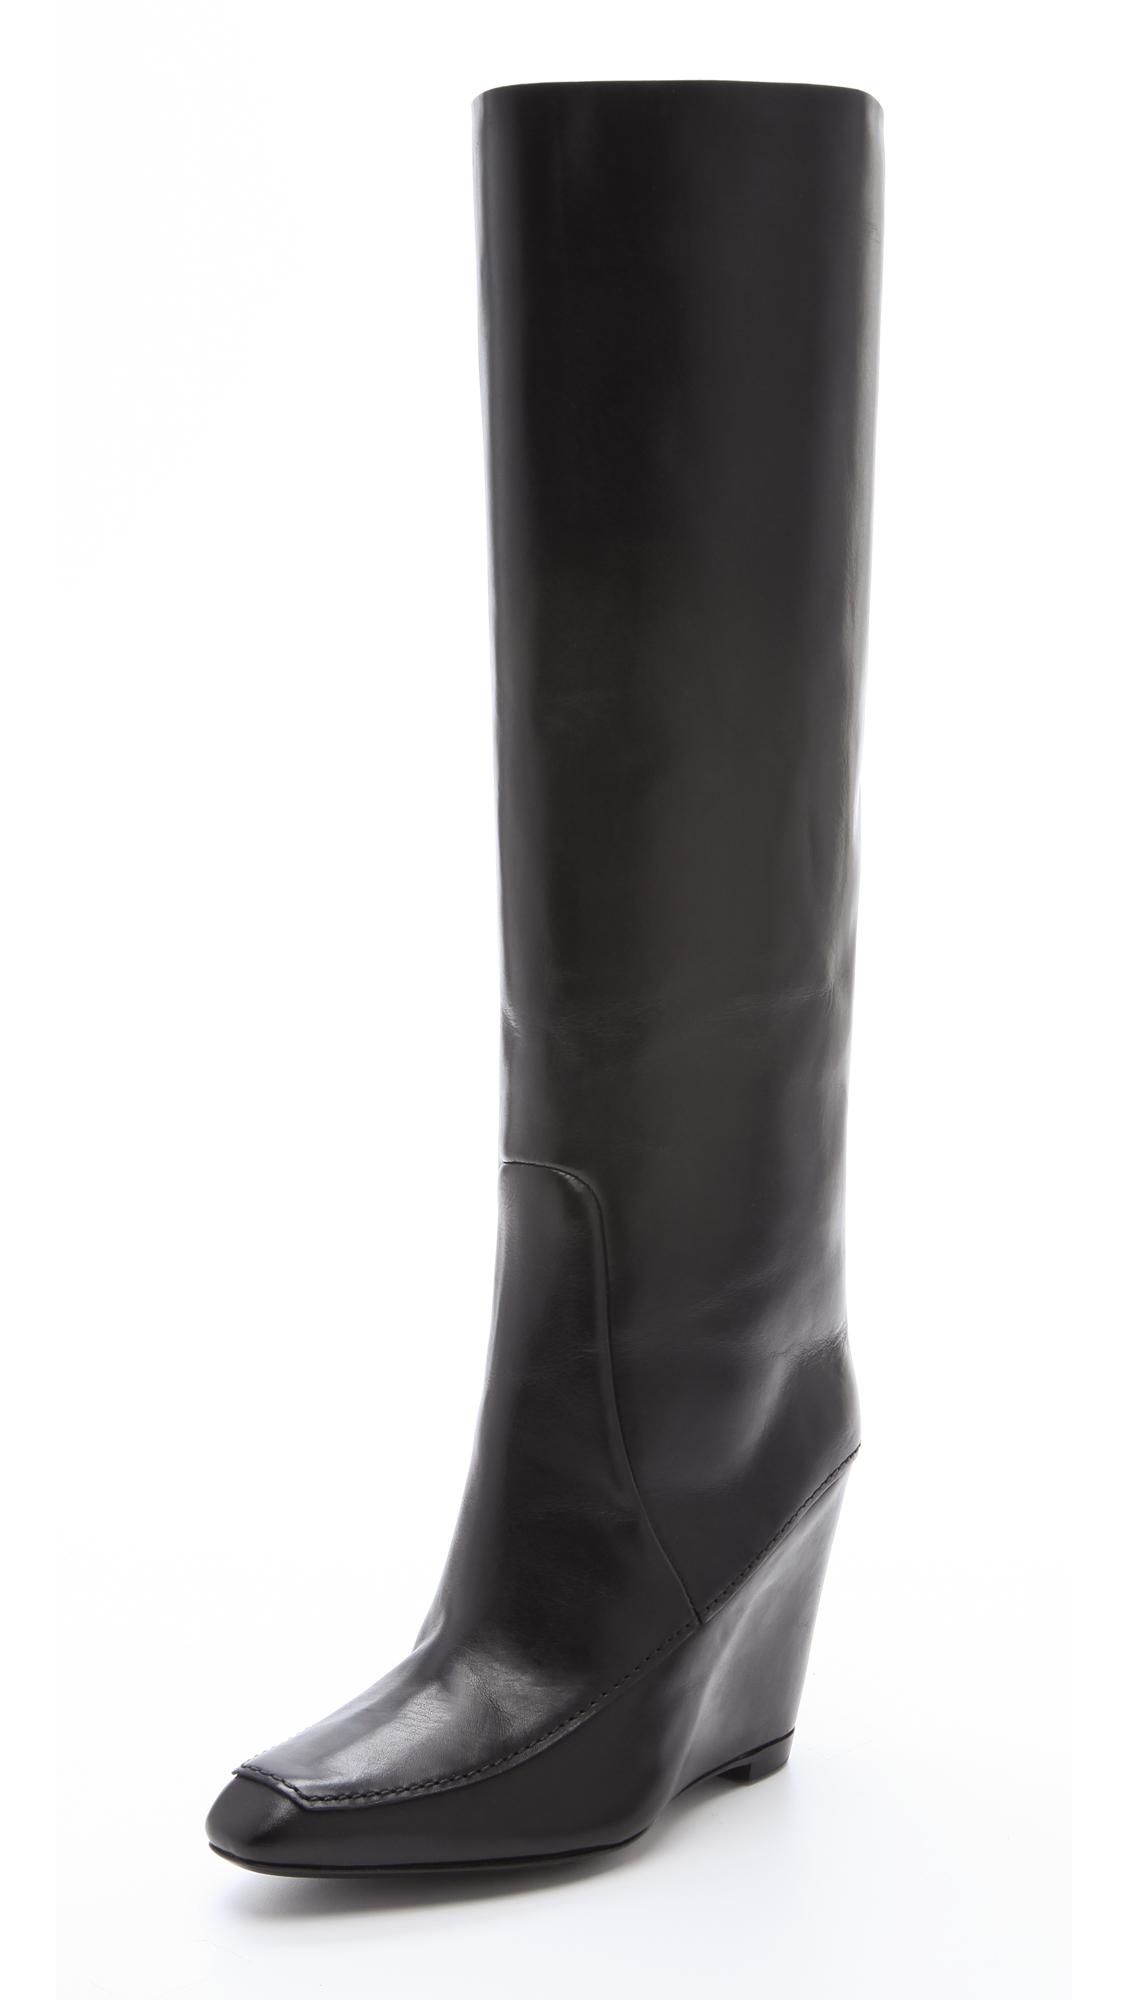 Alexander Wang Black Tall Cowboy Boots